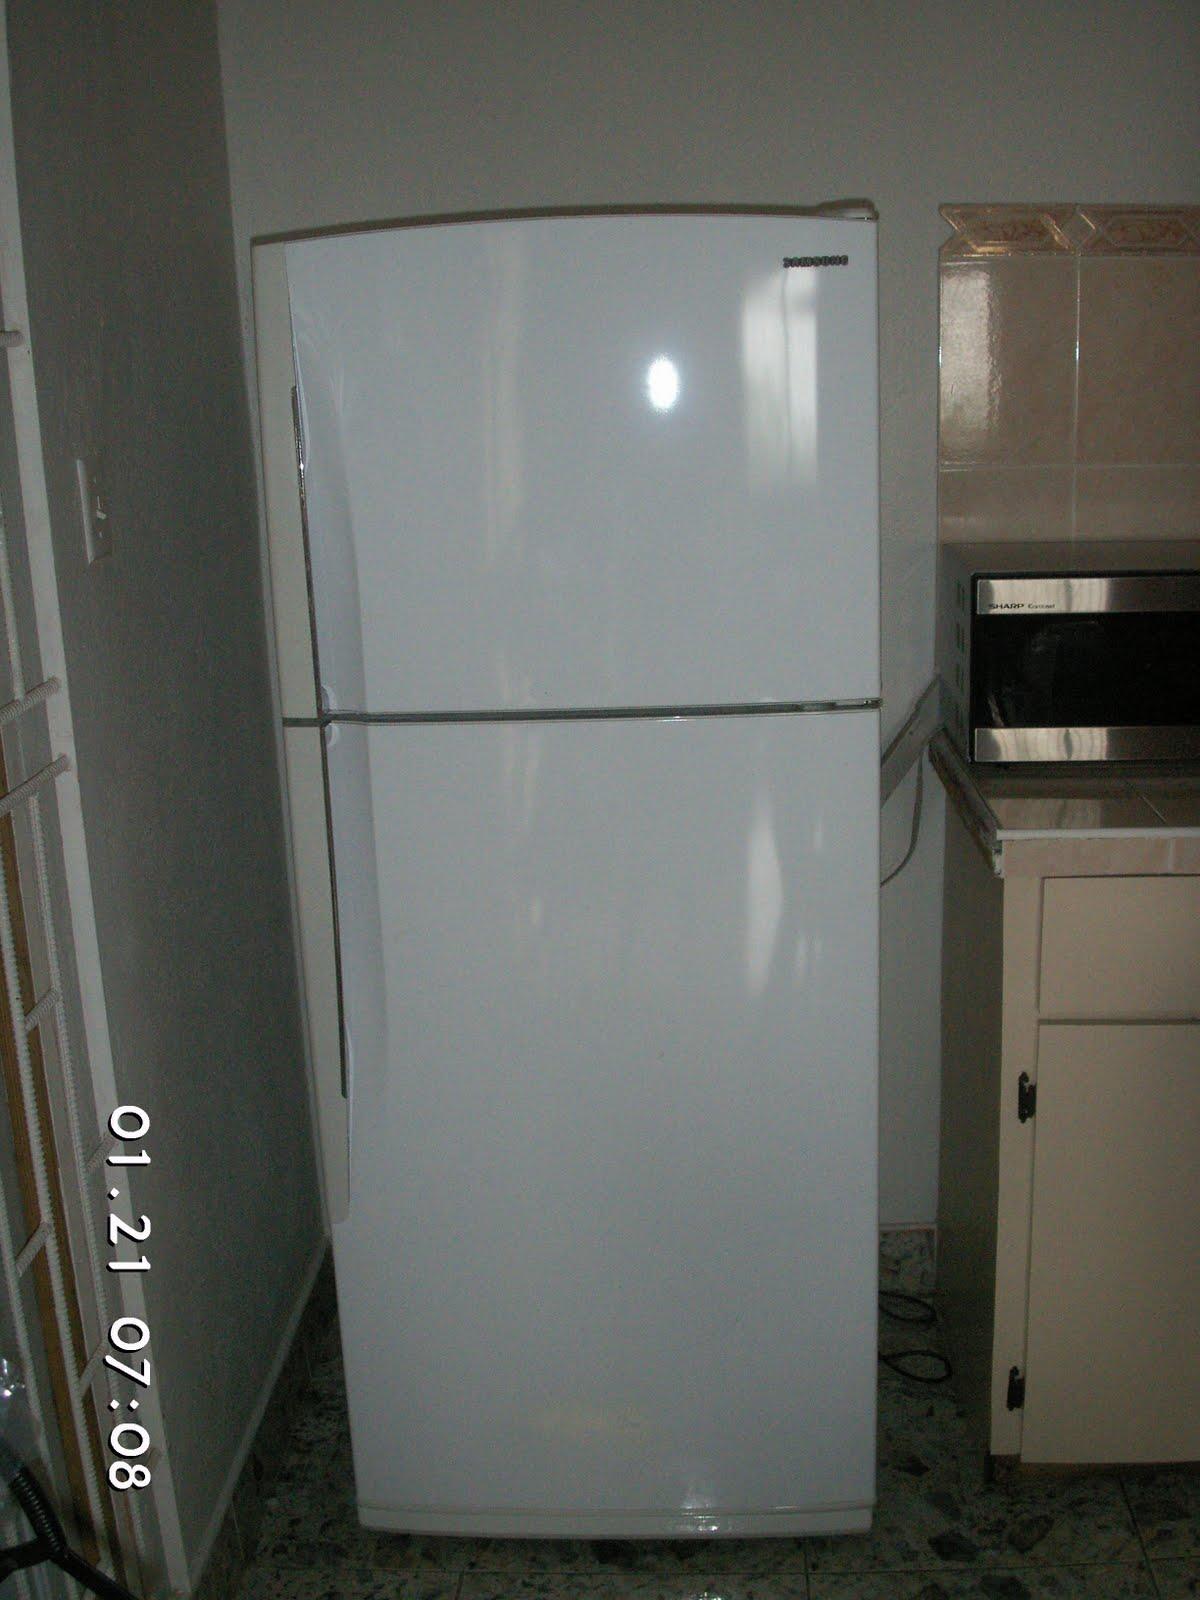 Michy S Going Away Sale Samsung Refrigerator